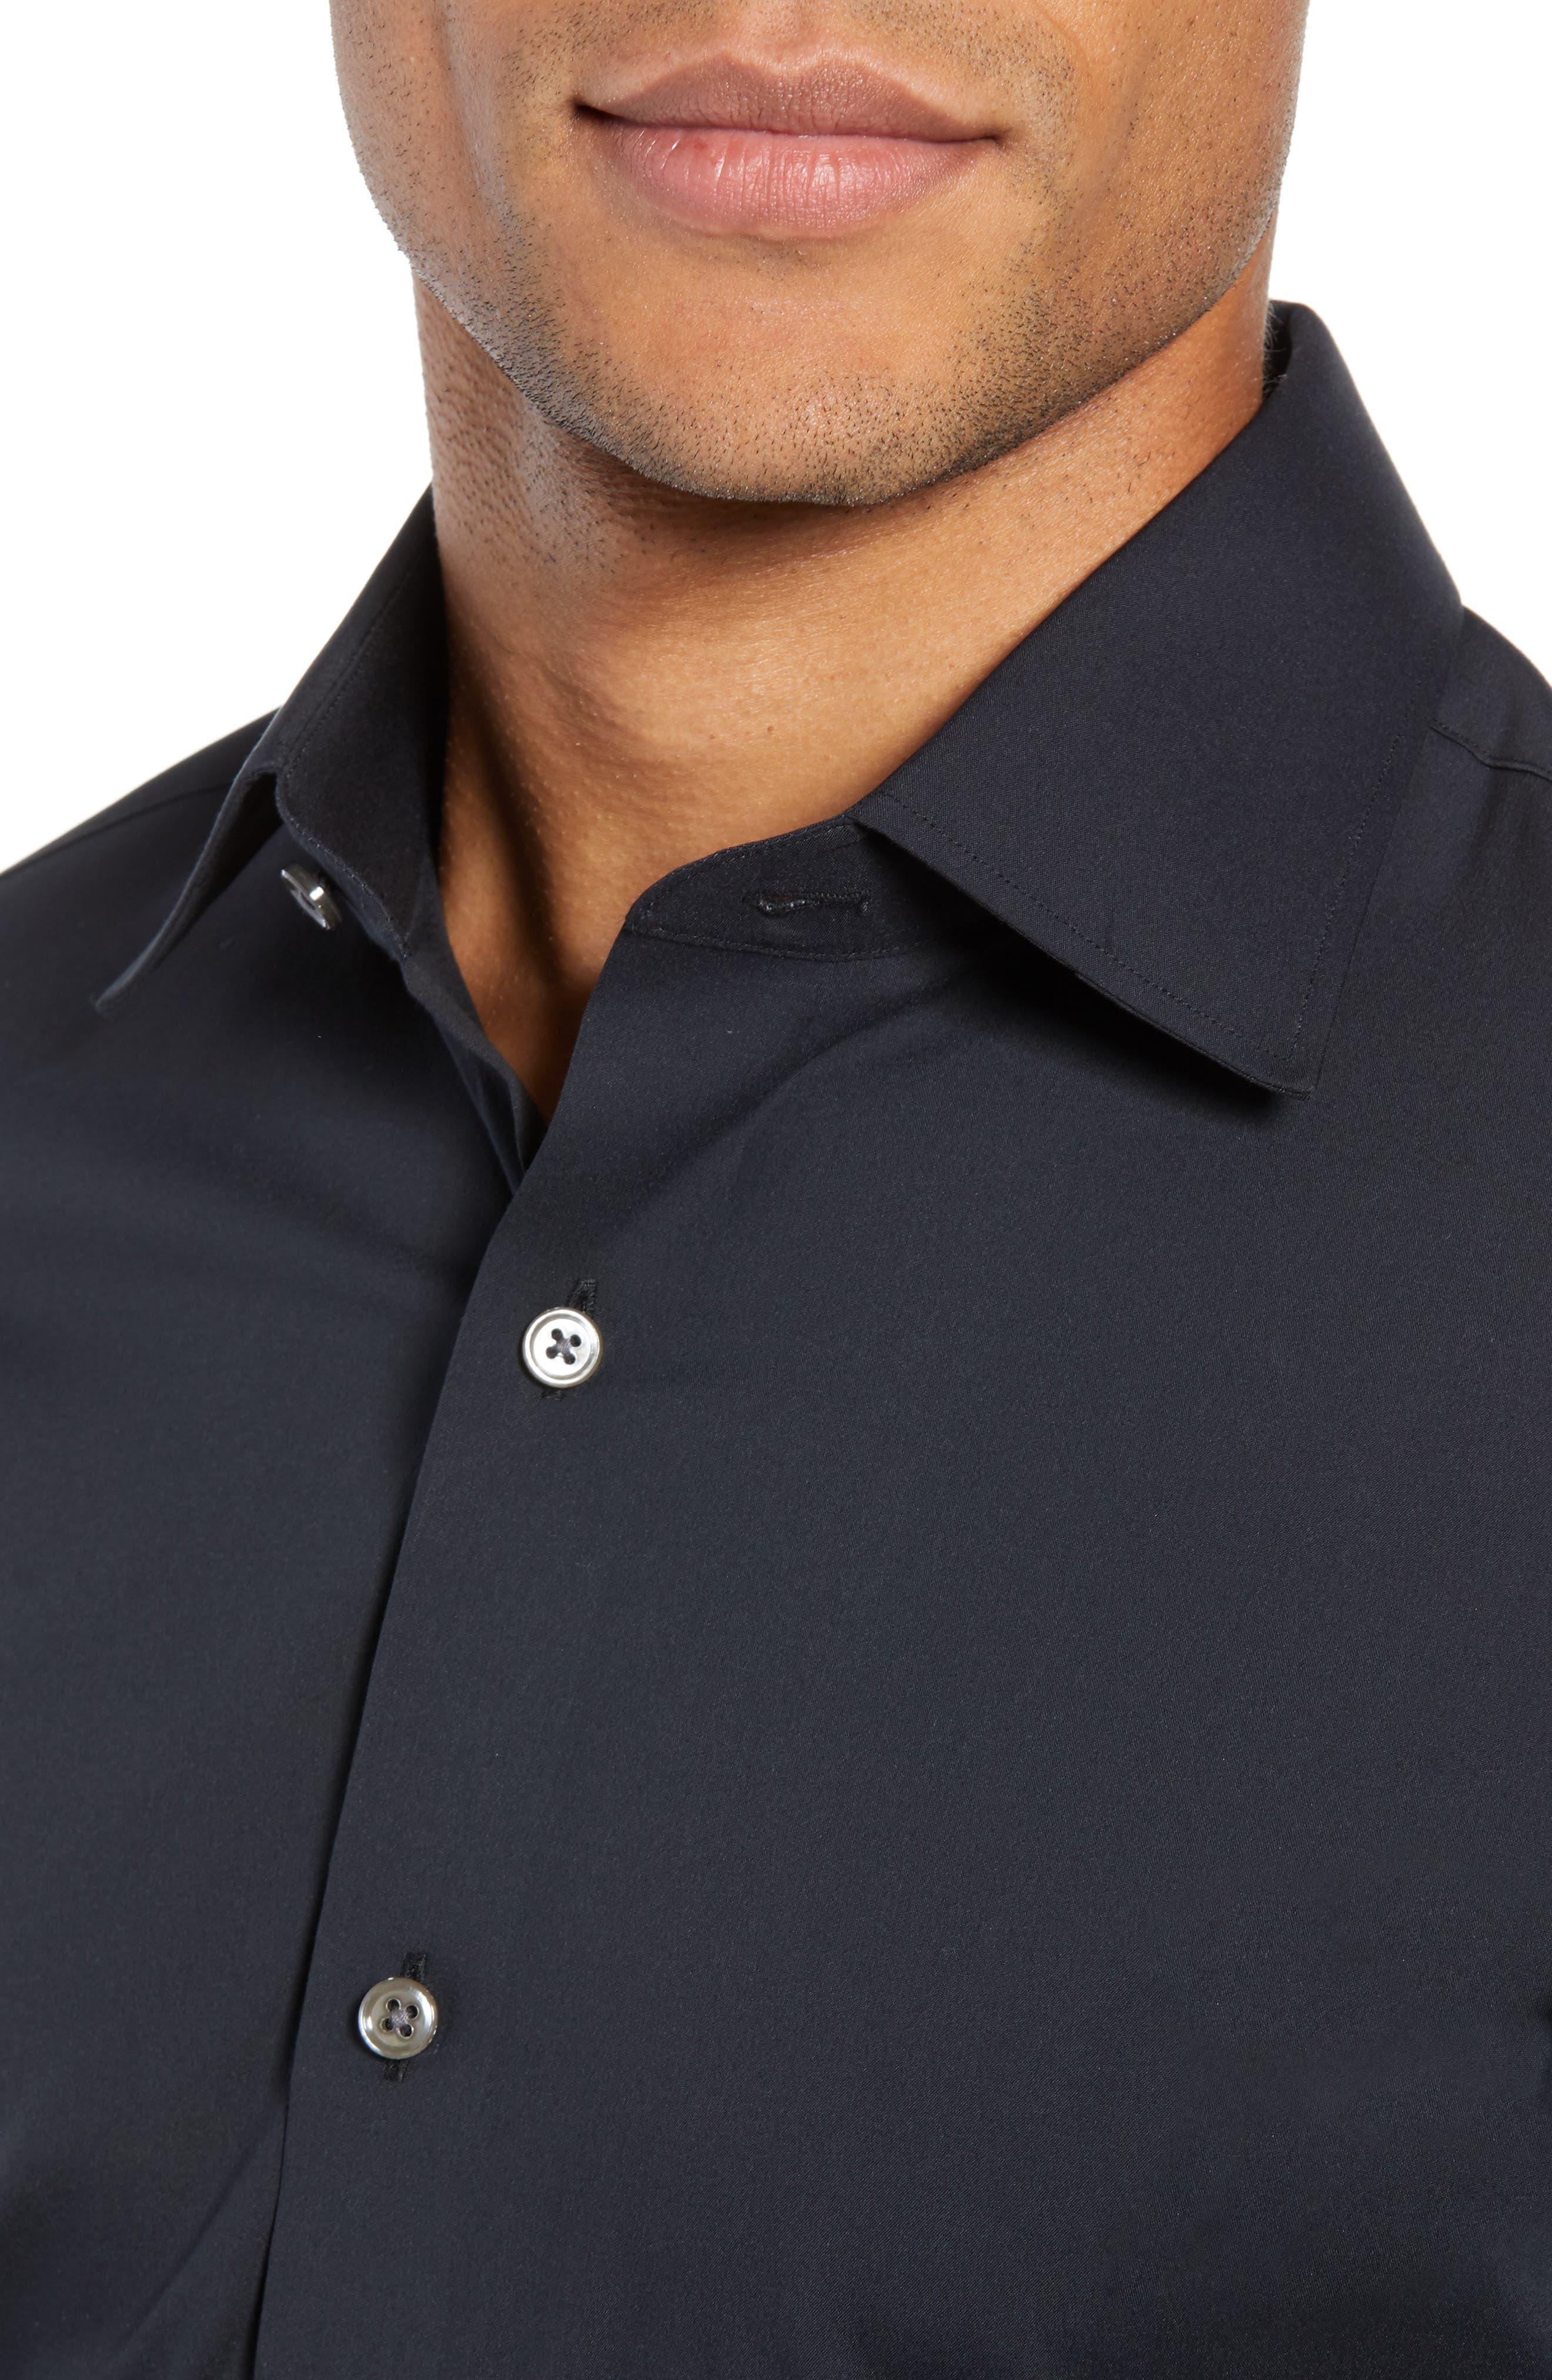 Jetsetter Slim Fit Solid Dress Shirt,                             Alternate thumbnail 2, color,                             BLACK